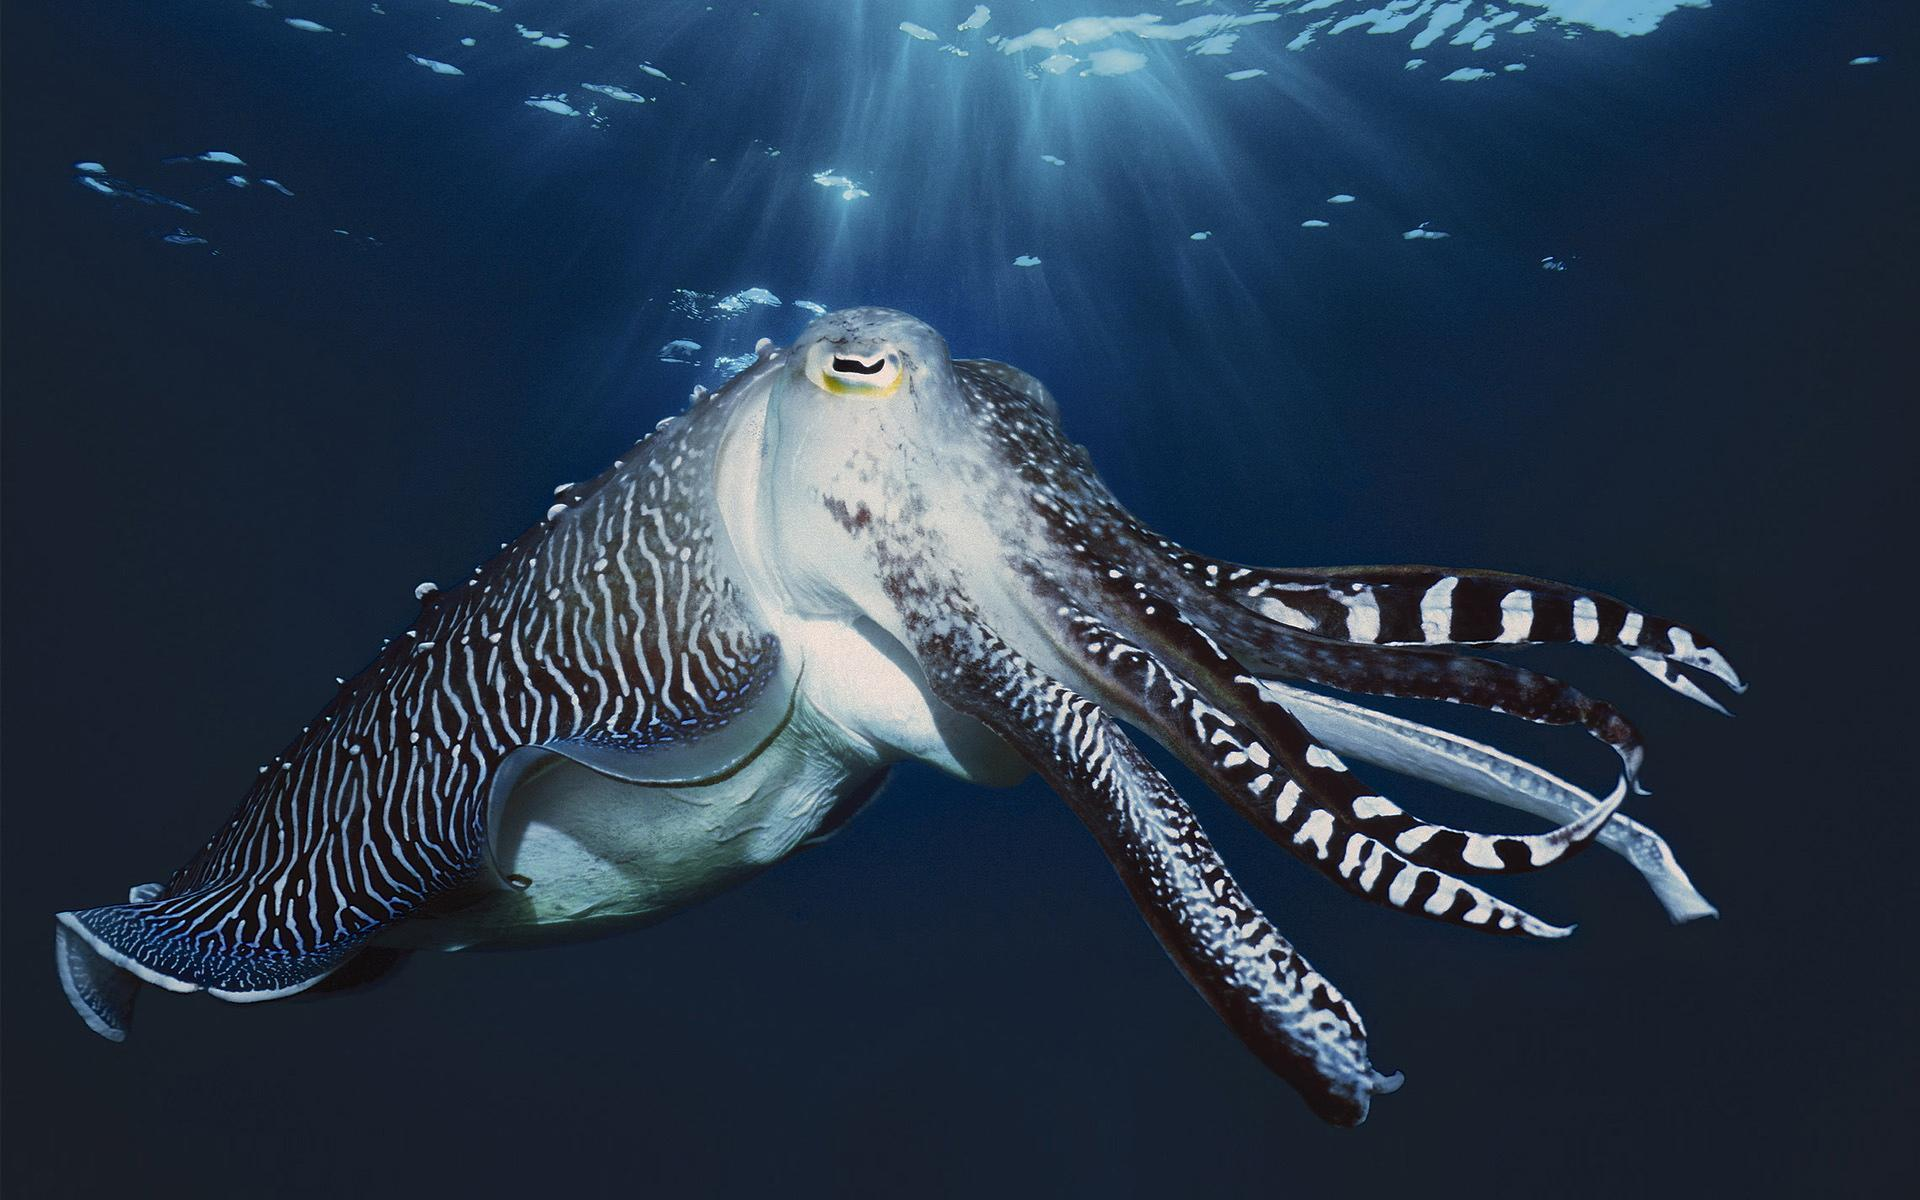 Cuttlefish wallpapers wallpaper cave for Blue sea motor inn